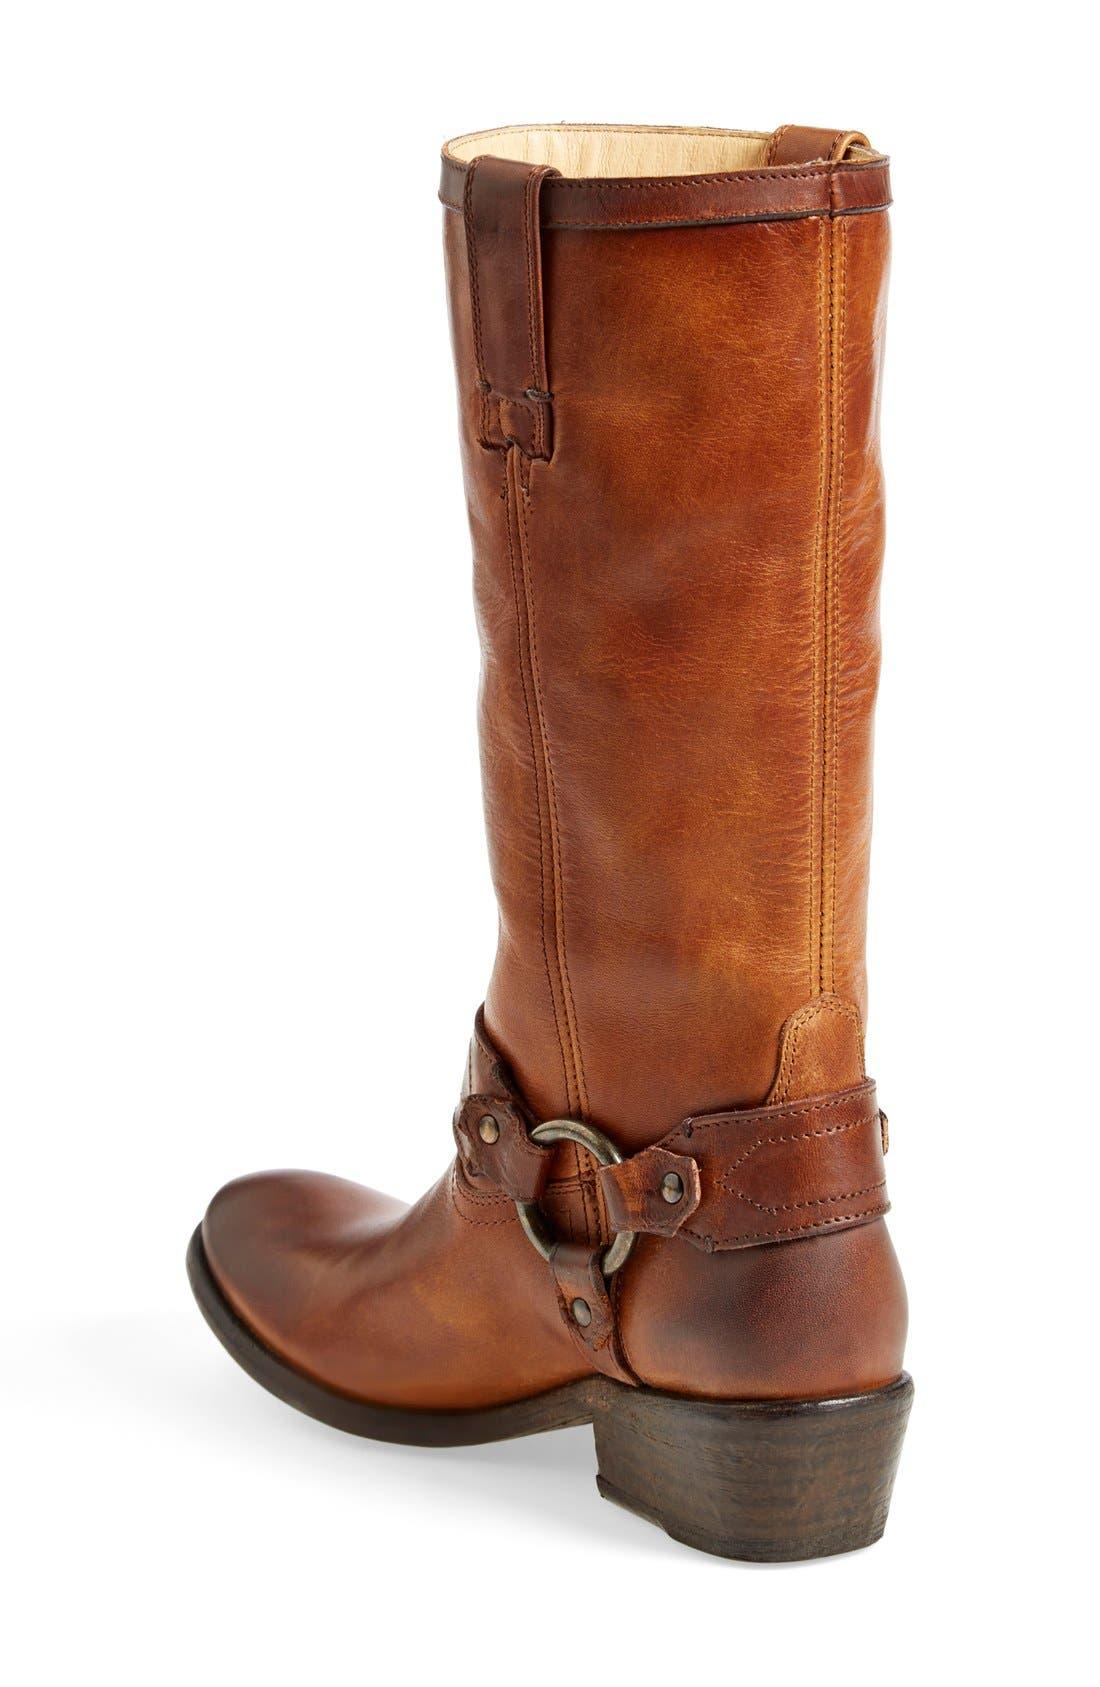 Alternate Image 2  - Frye 'Carson Harness' Western Mid Calf Riding Boot (Women)